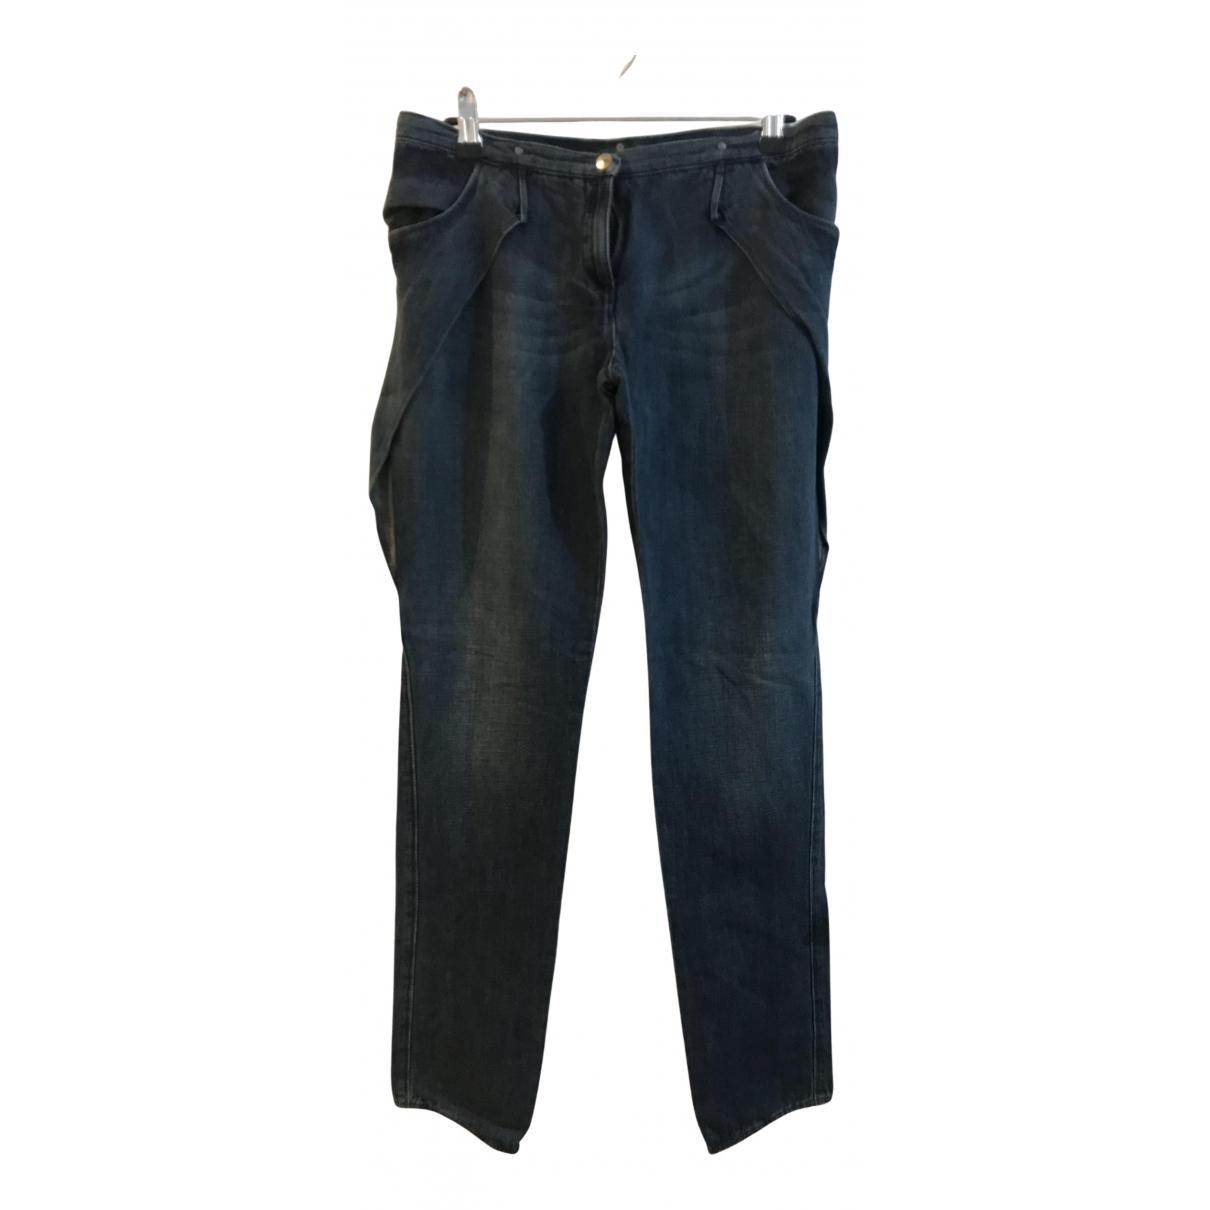 Nina Ricci - Jean   pour femme en coton - bleu